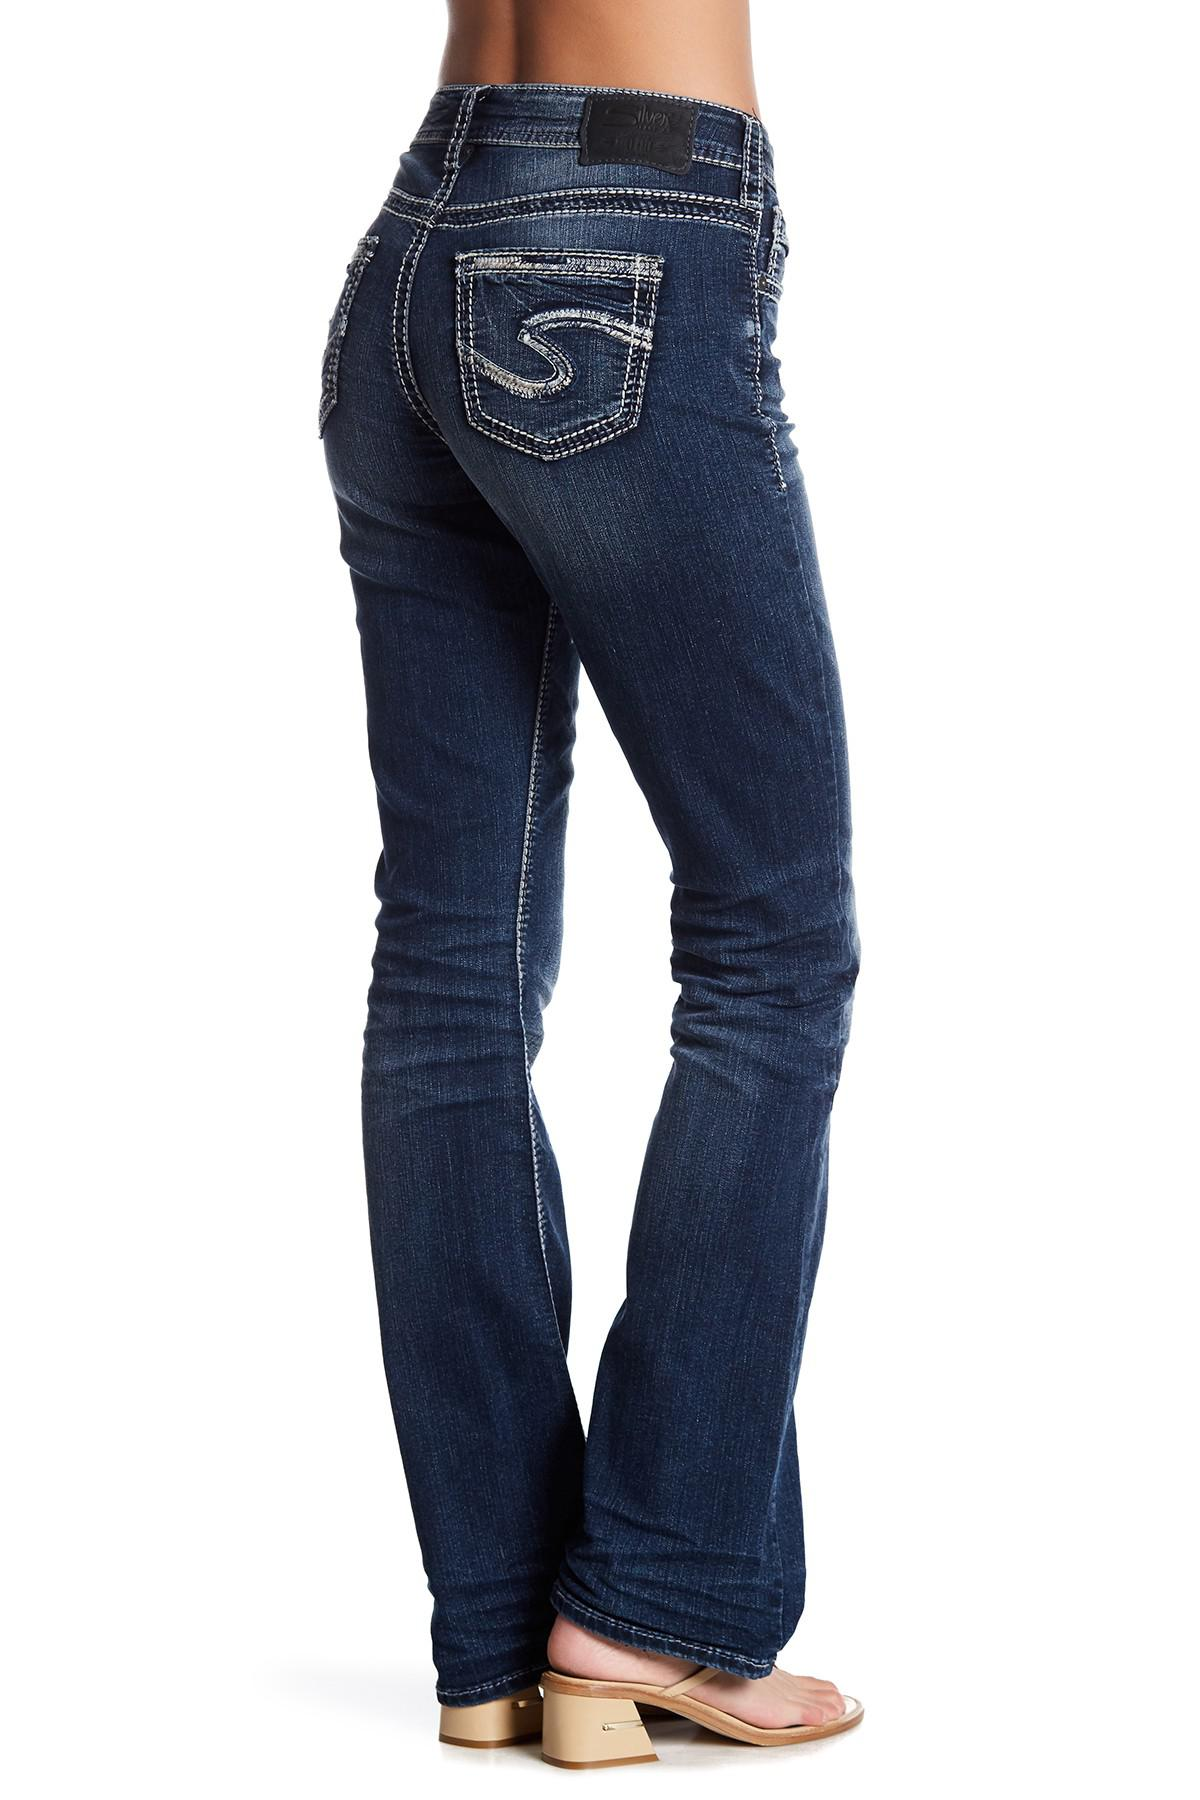 Lyst - Silver Jeans Co. Suki High Rise Bootcut Jean - 33